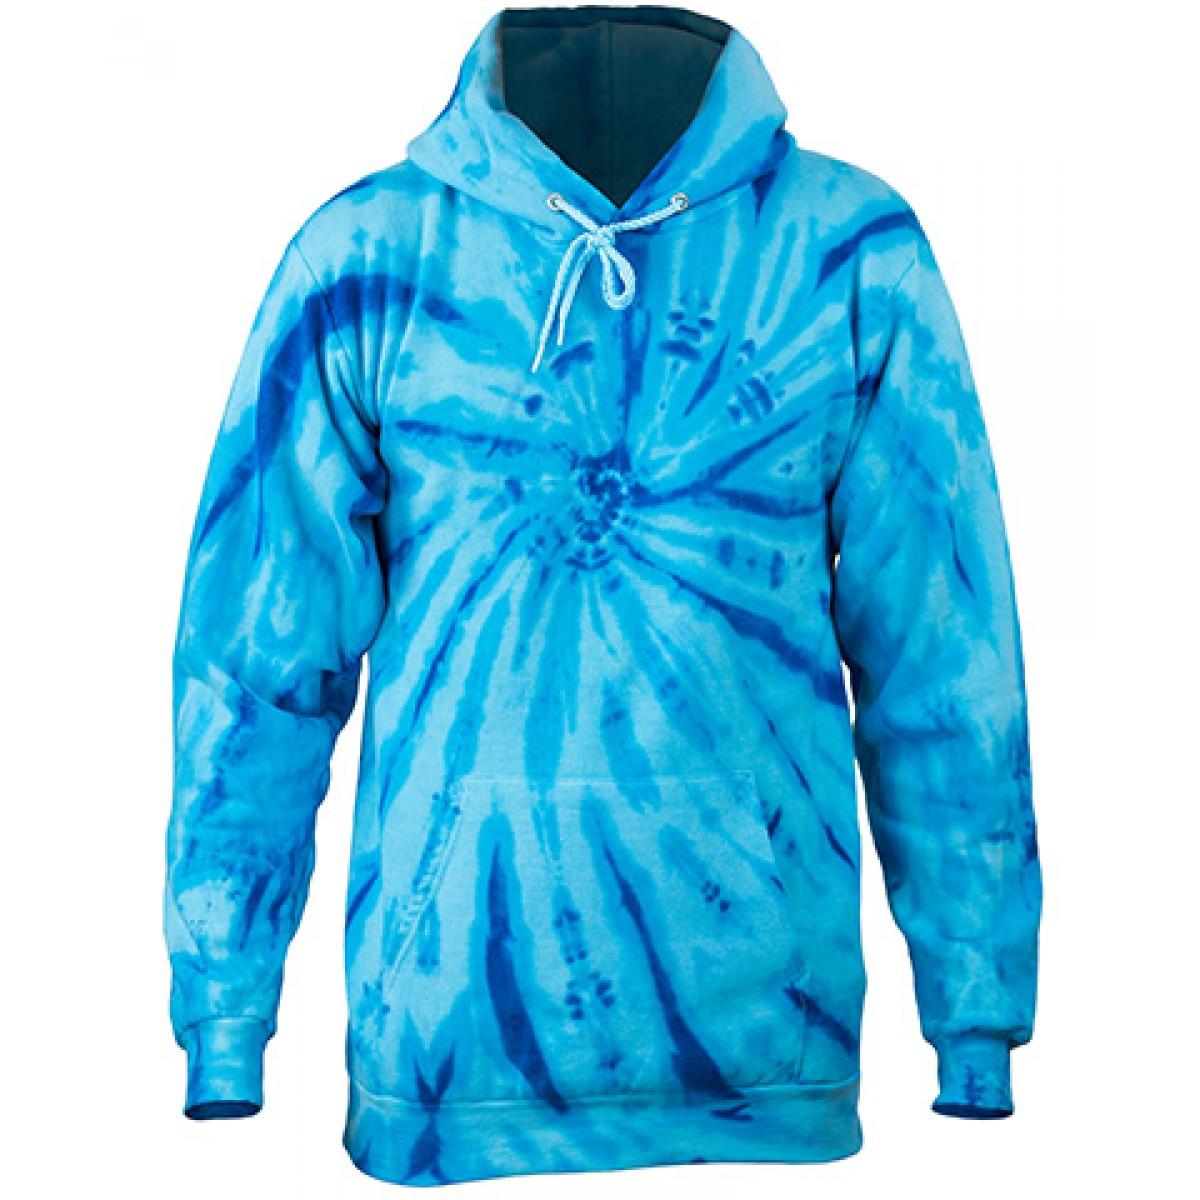 Tie-Dye Pullover Hooded Sweatshirt-Tropic Blue-M